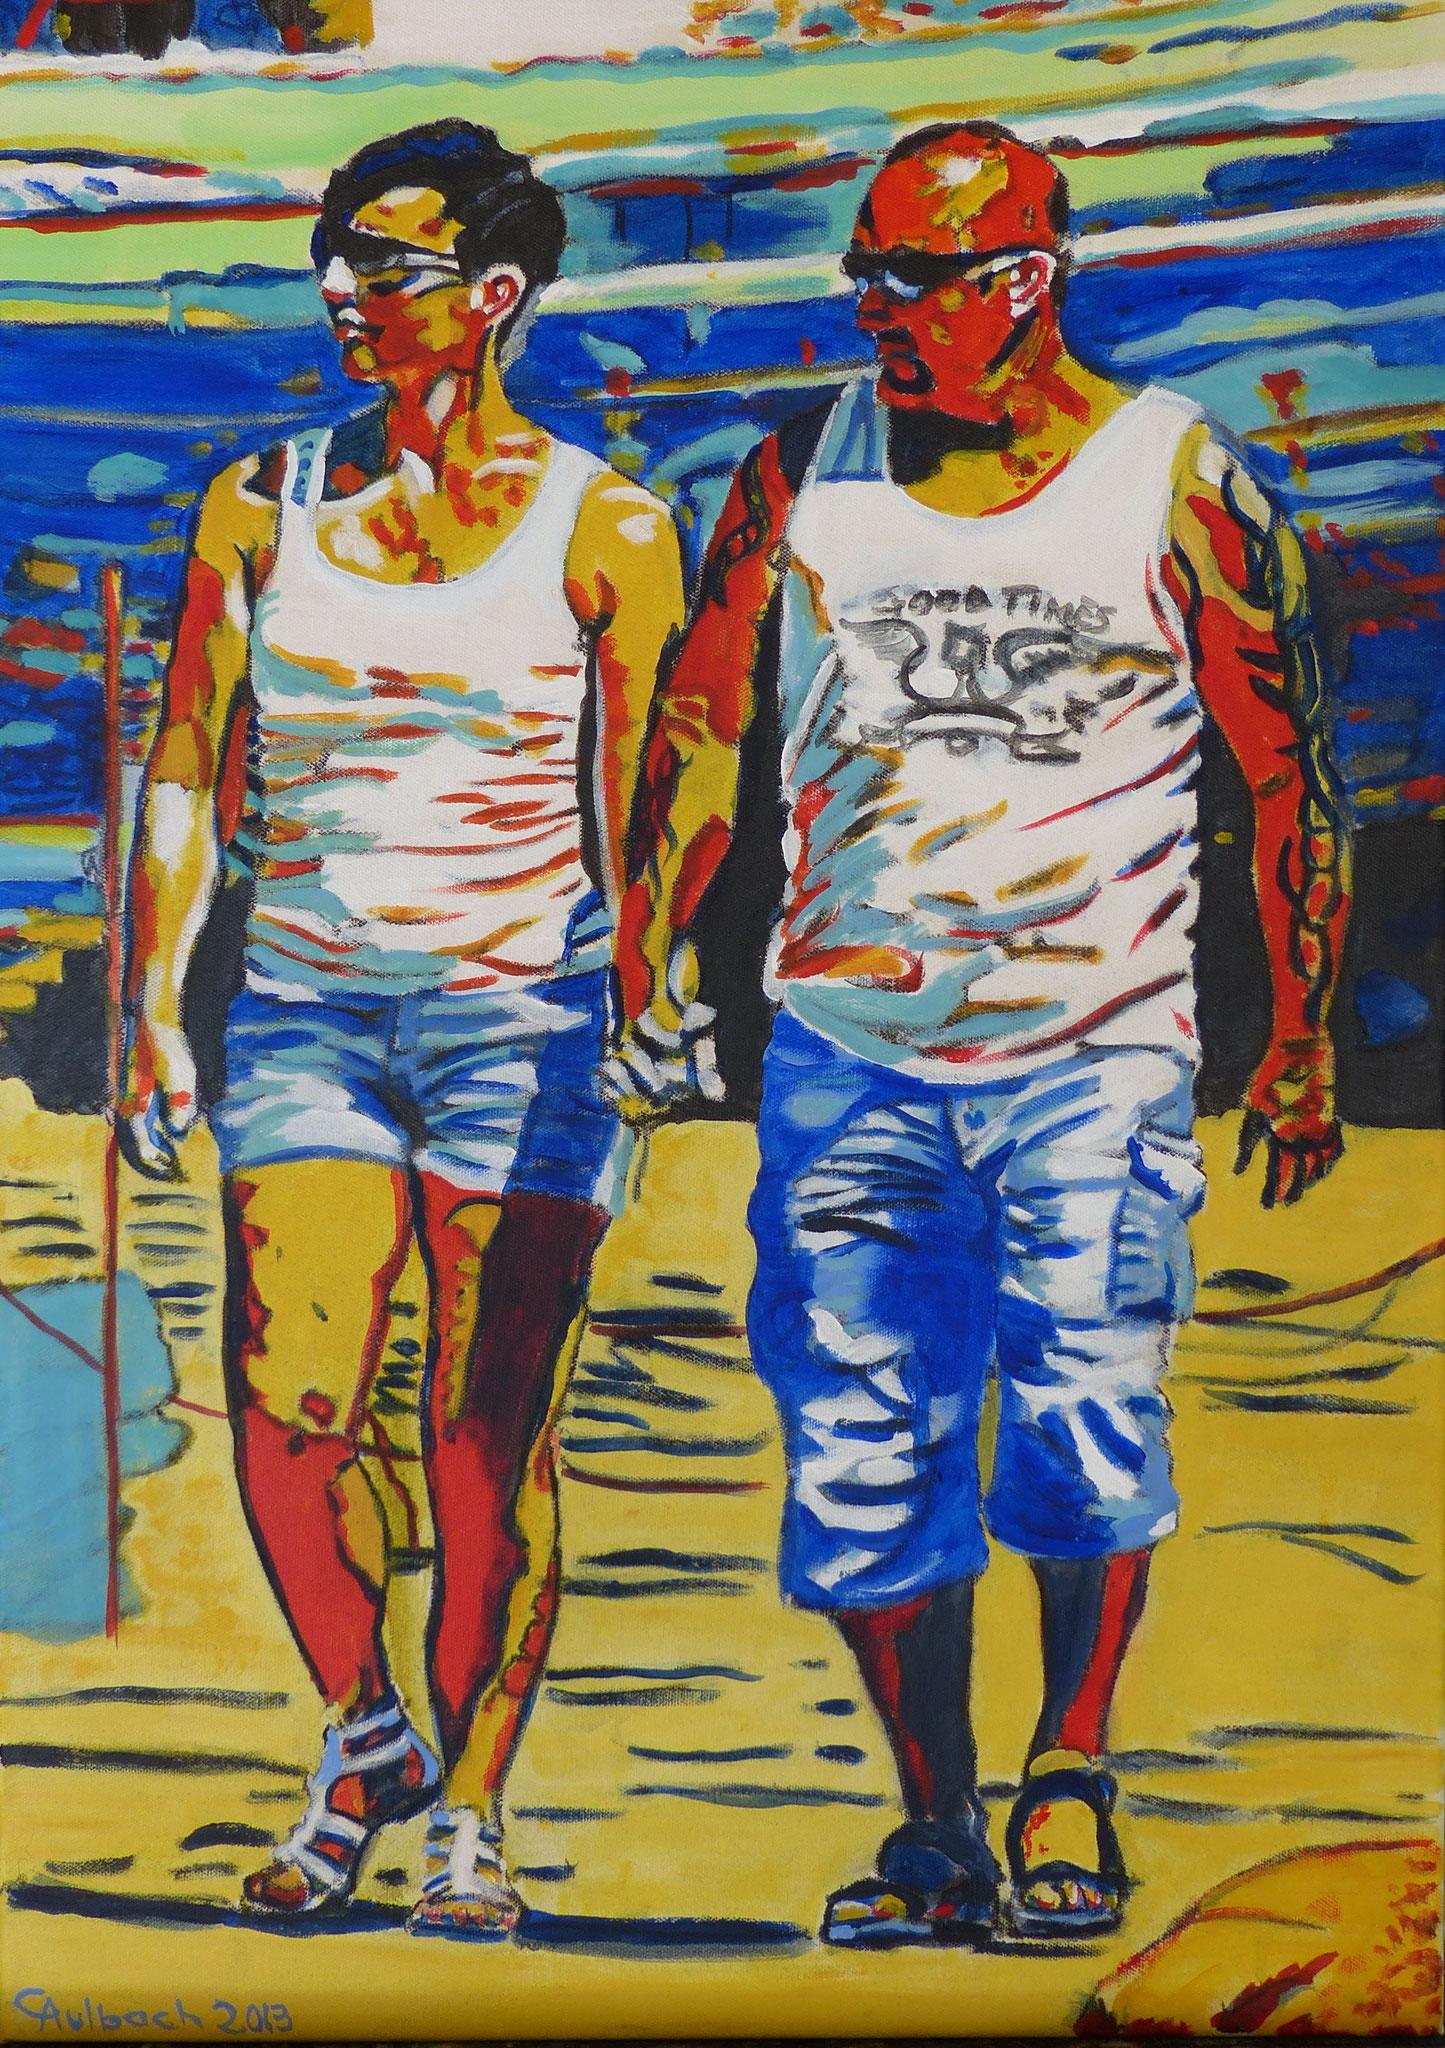 Ugly tourists IV, 2013, 80 x 60cm, Öl auf Leinwand